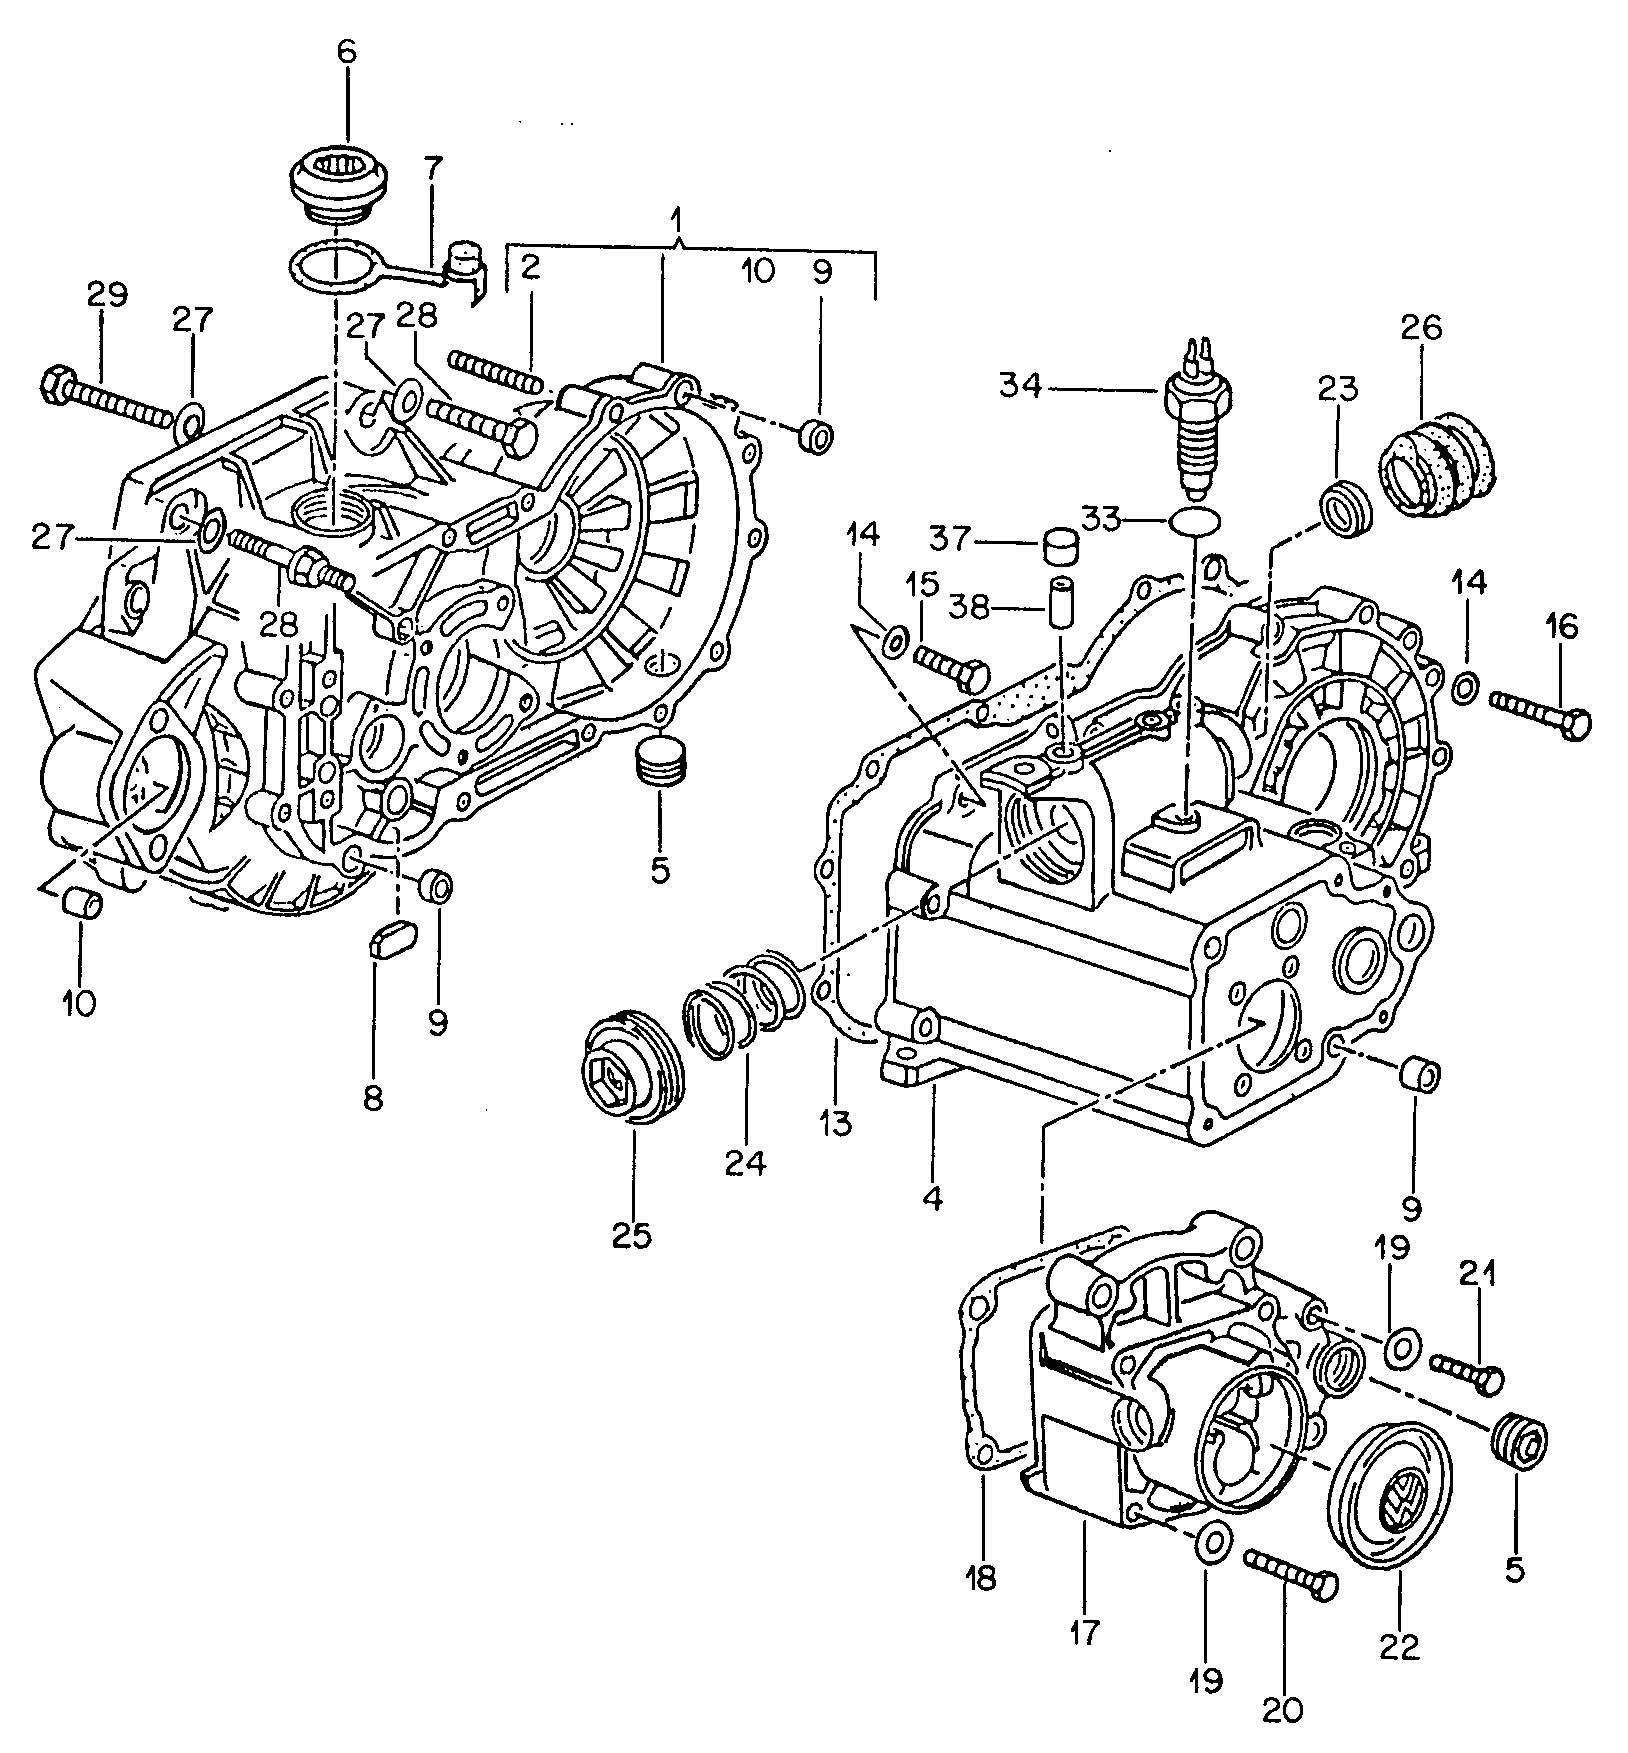 volkswagen beetle transmission diagram  volkswagen  free